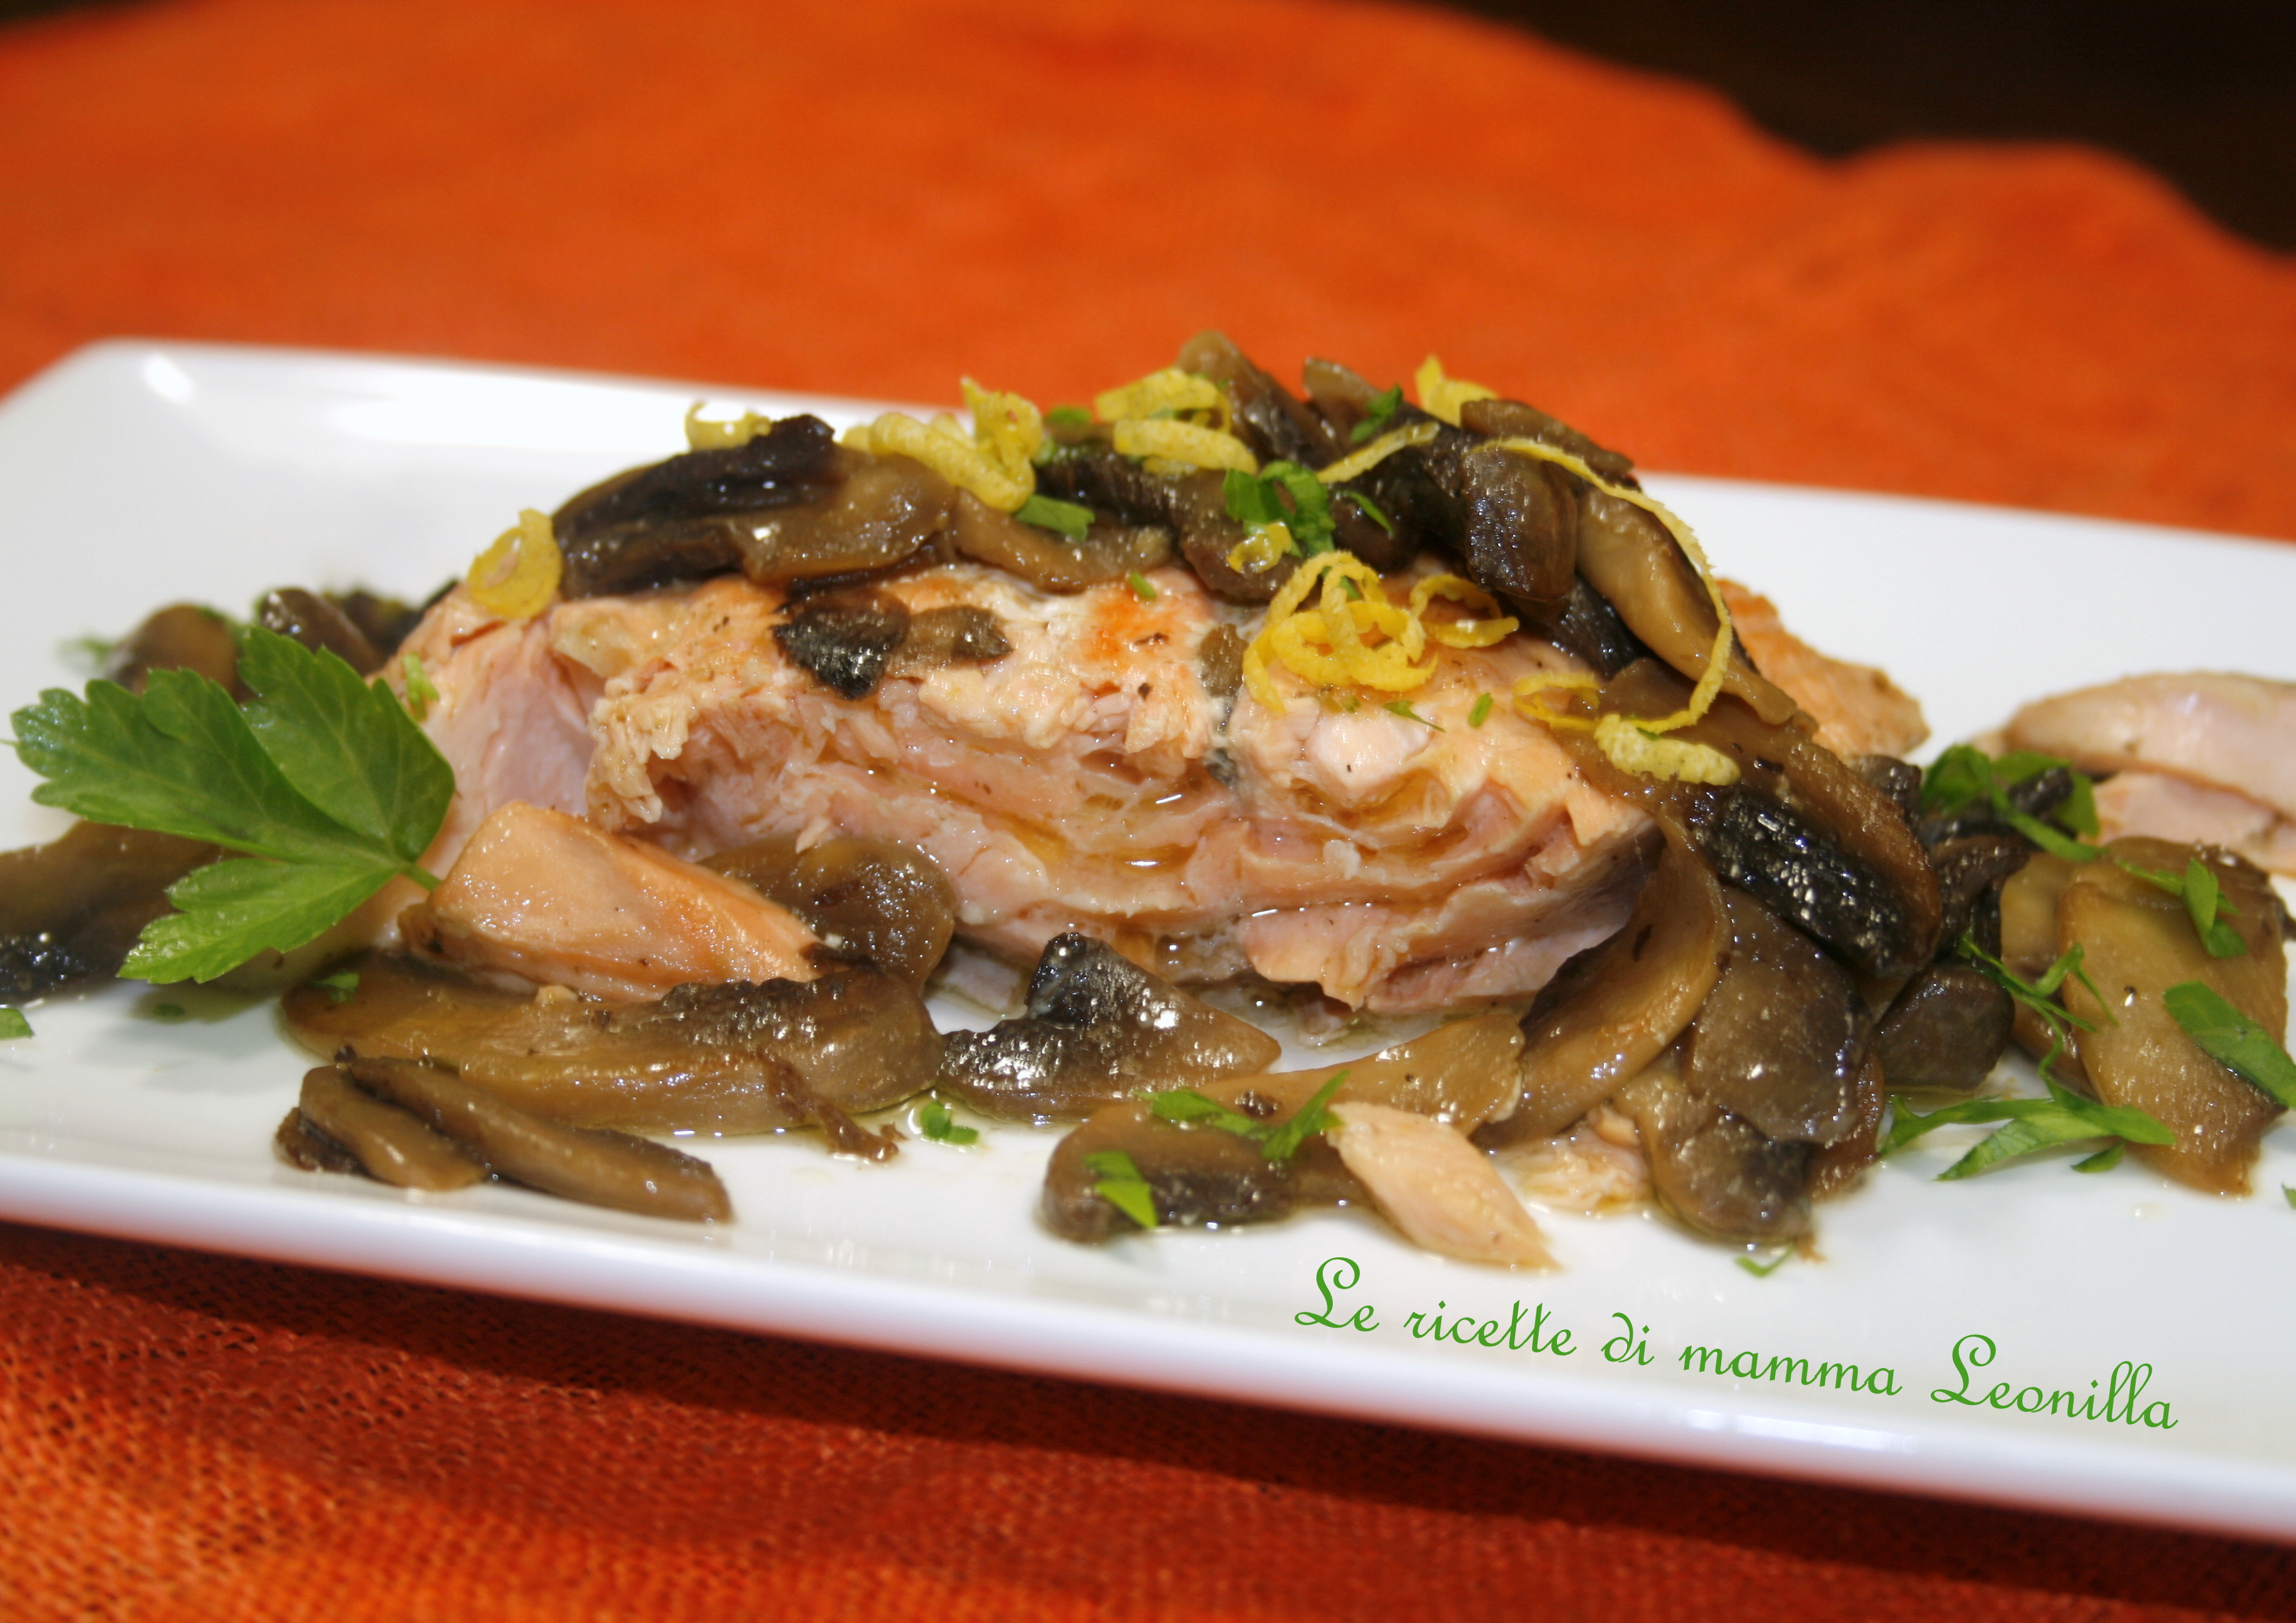 SALMONE AI FUNGHI E LIMONE -ricetta di pesce light